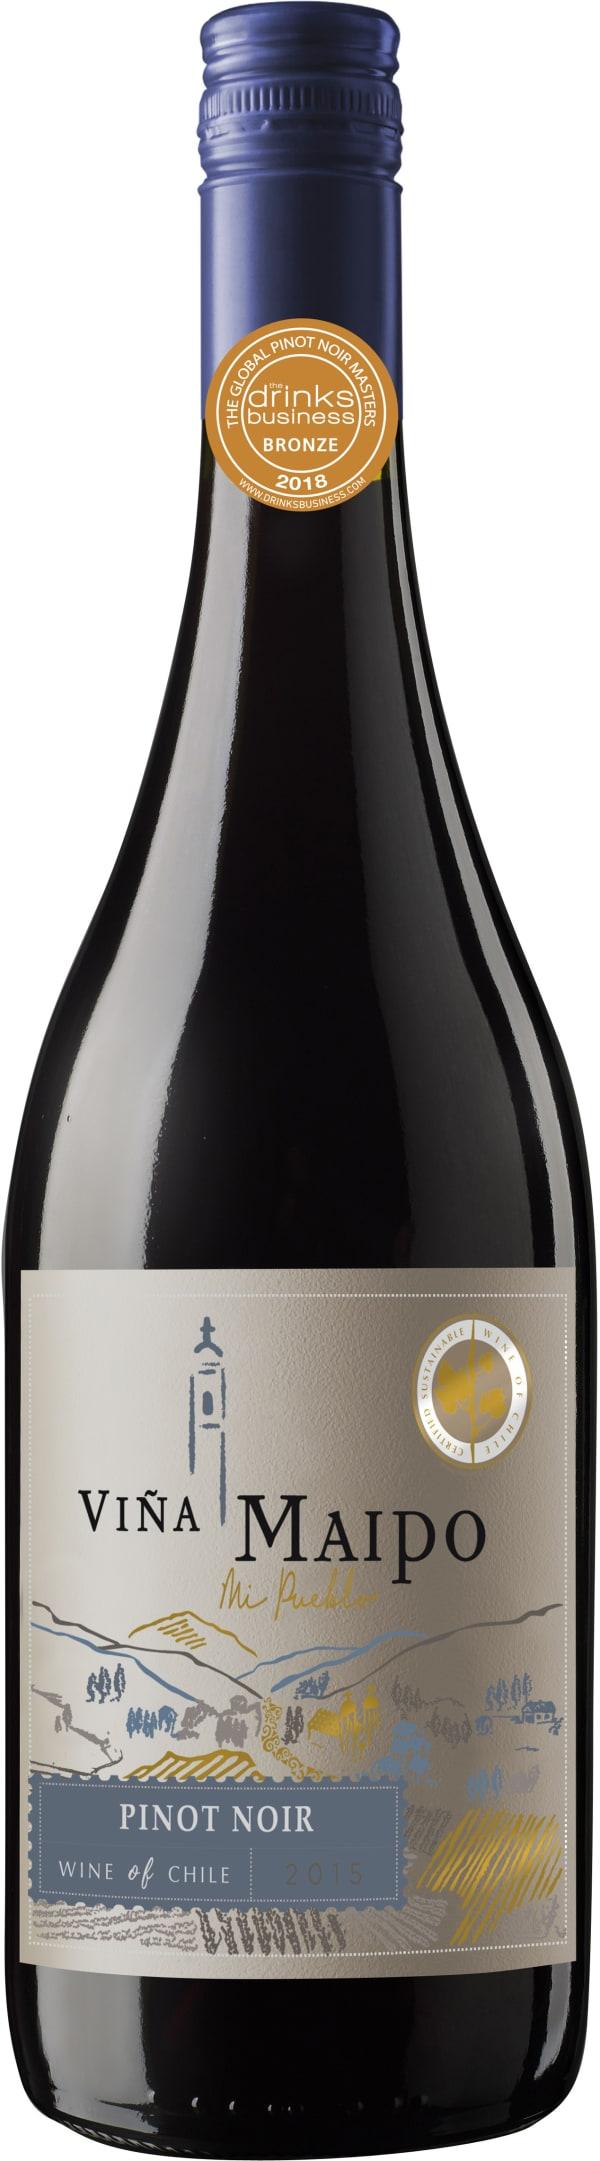 Viña Maipo Pinot Noir 2016